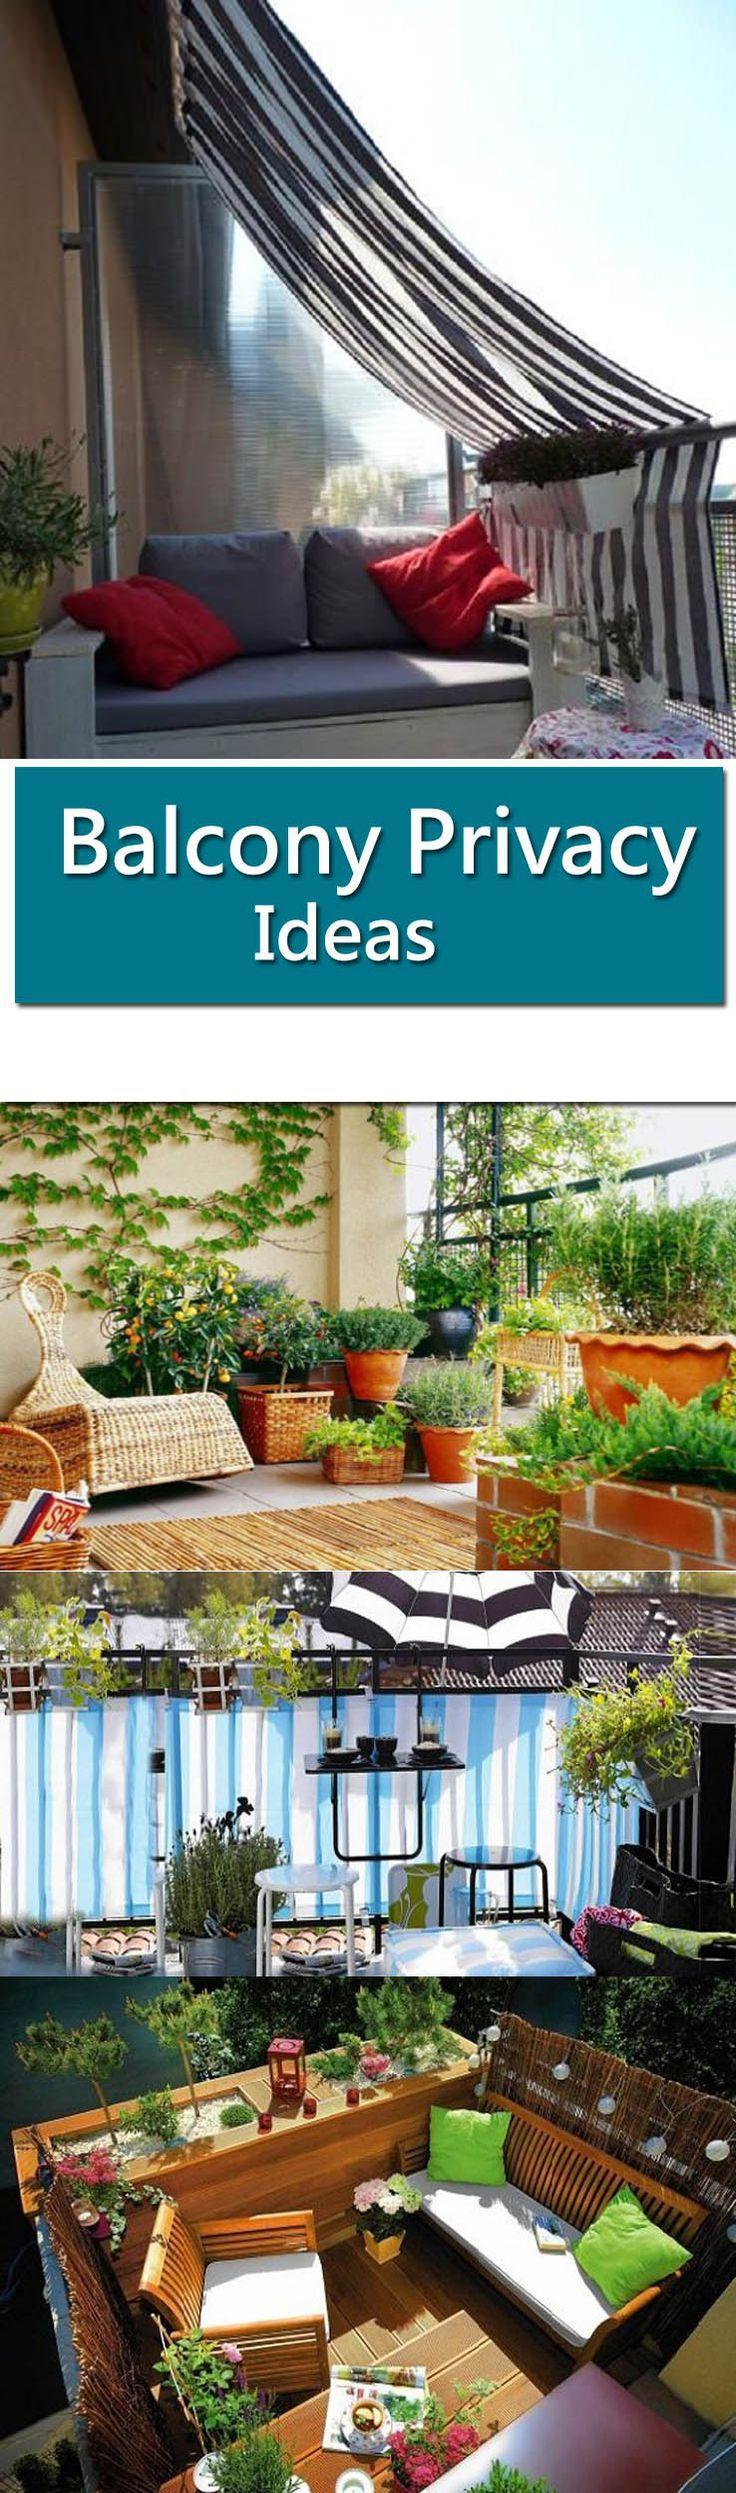 8 Practical Balcony Privacy Ideas – #Balcony #Ideas #Practical #Privacy #rideau